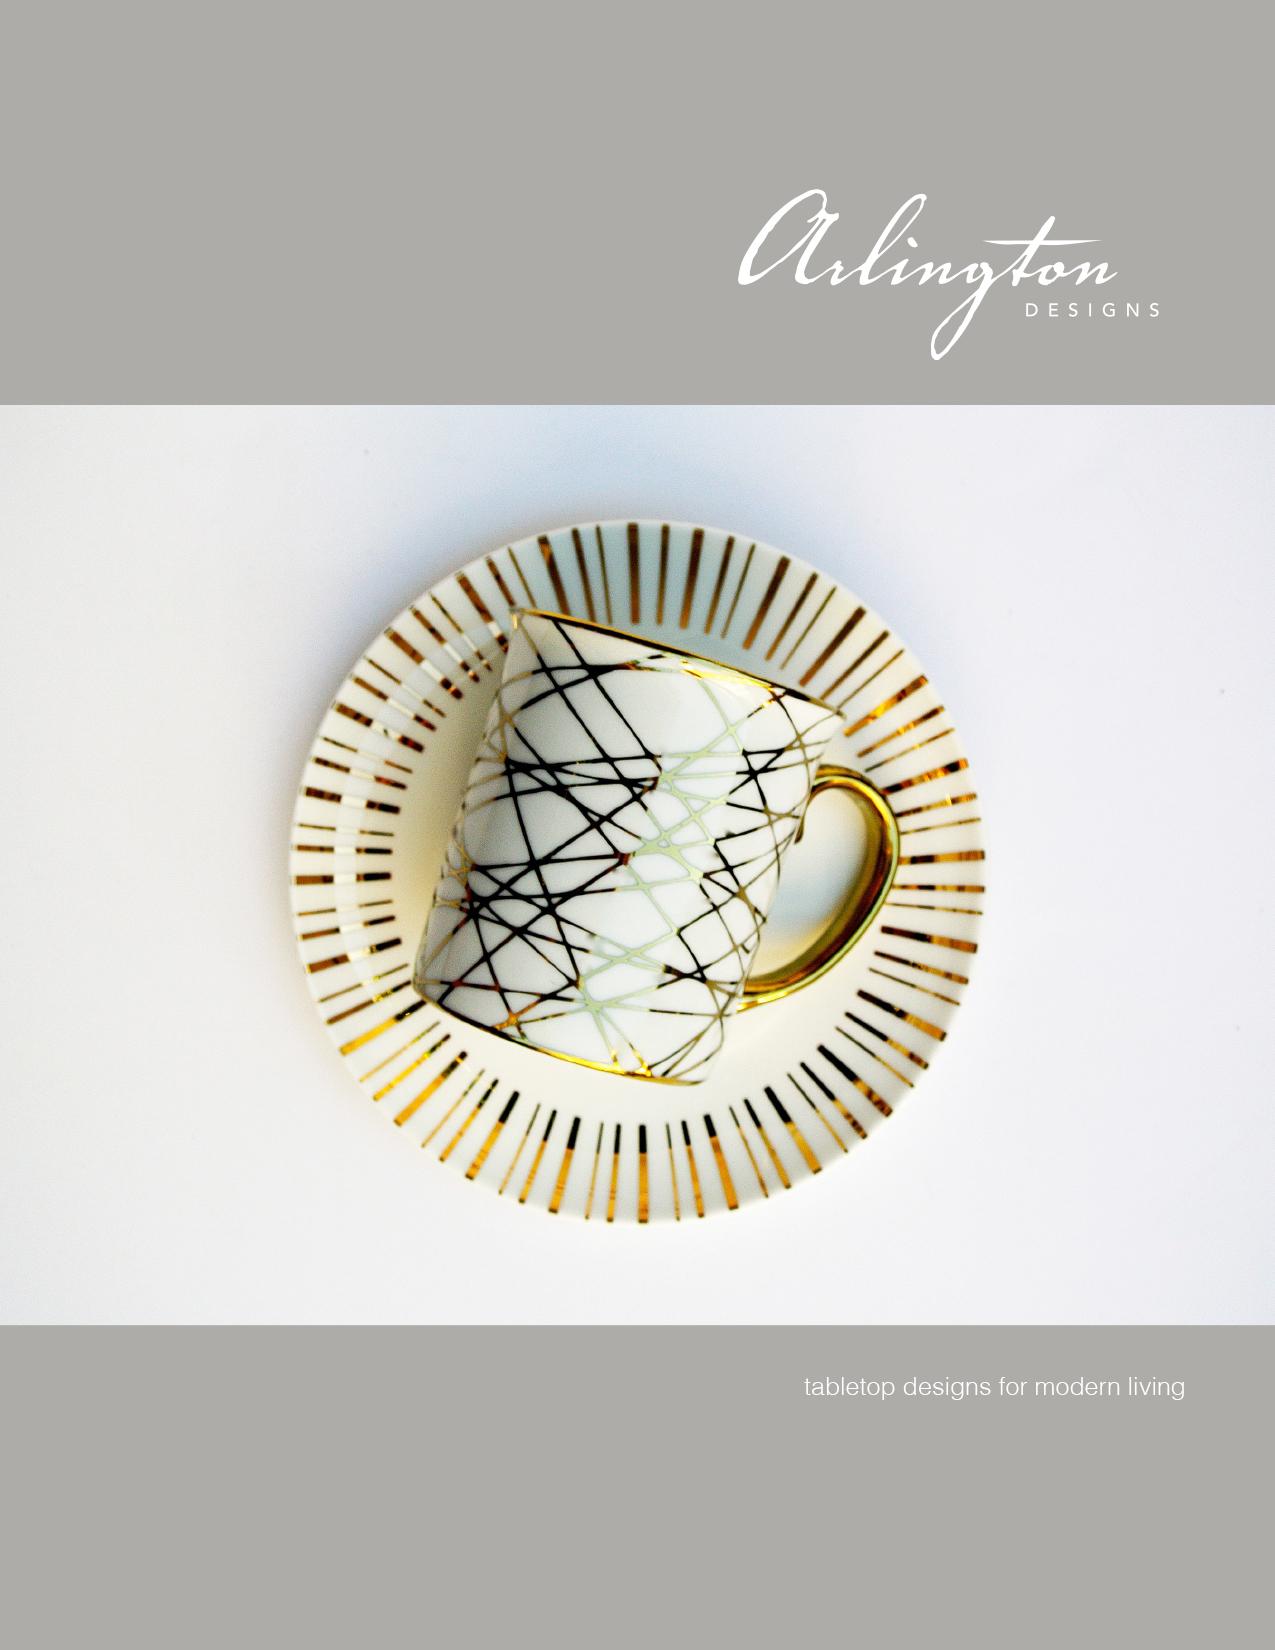 Brochure design for Arlington Designs